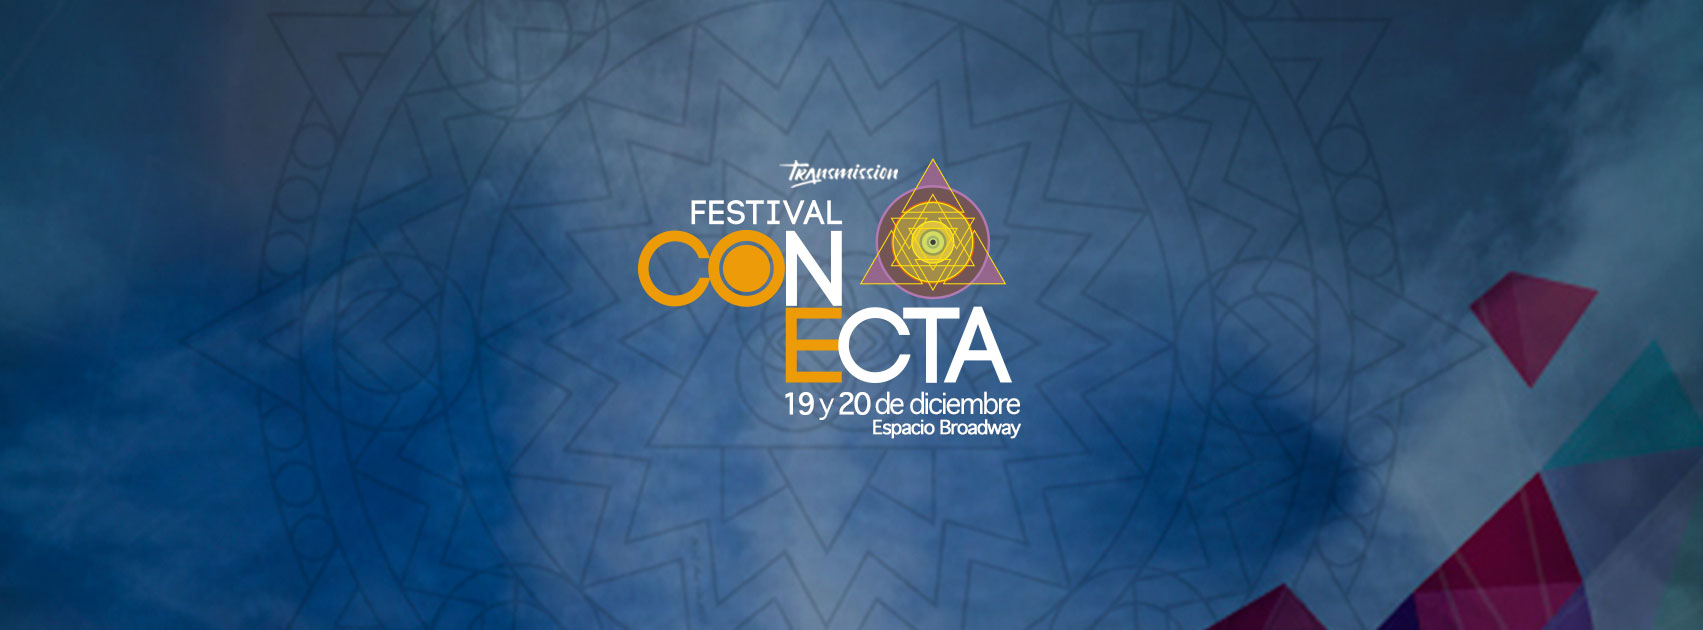 Festival Conecta 2015